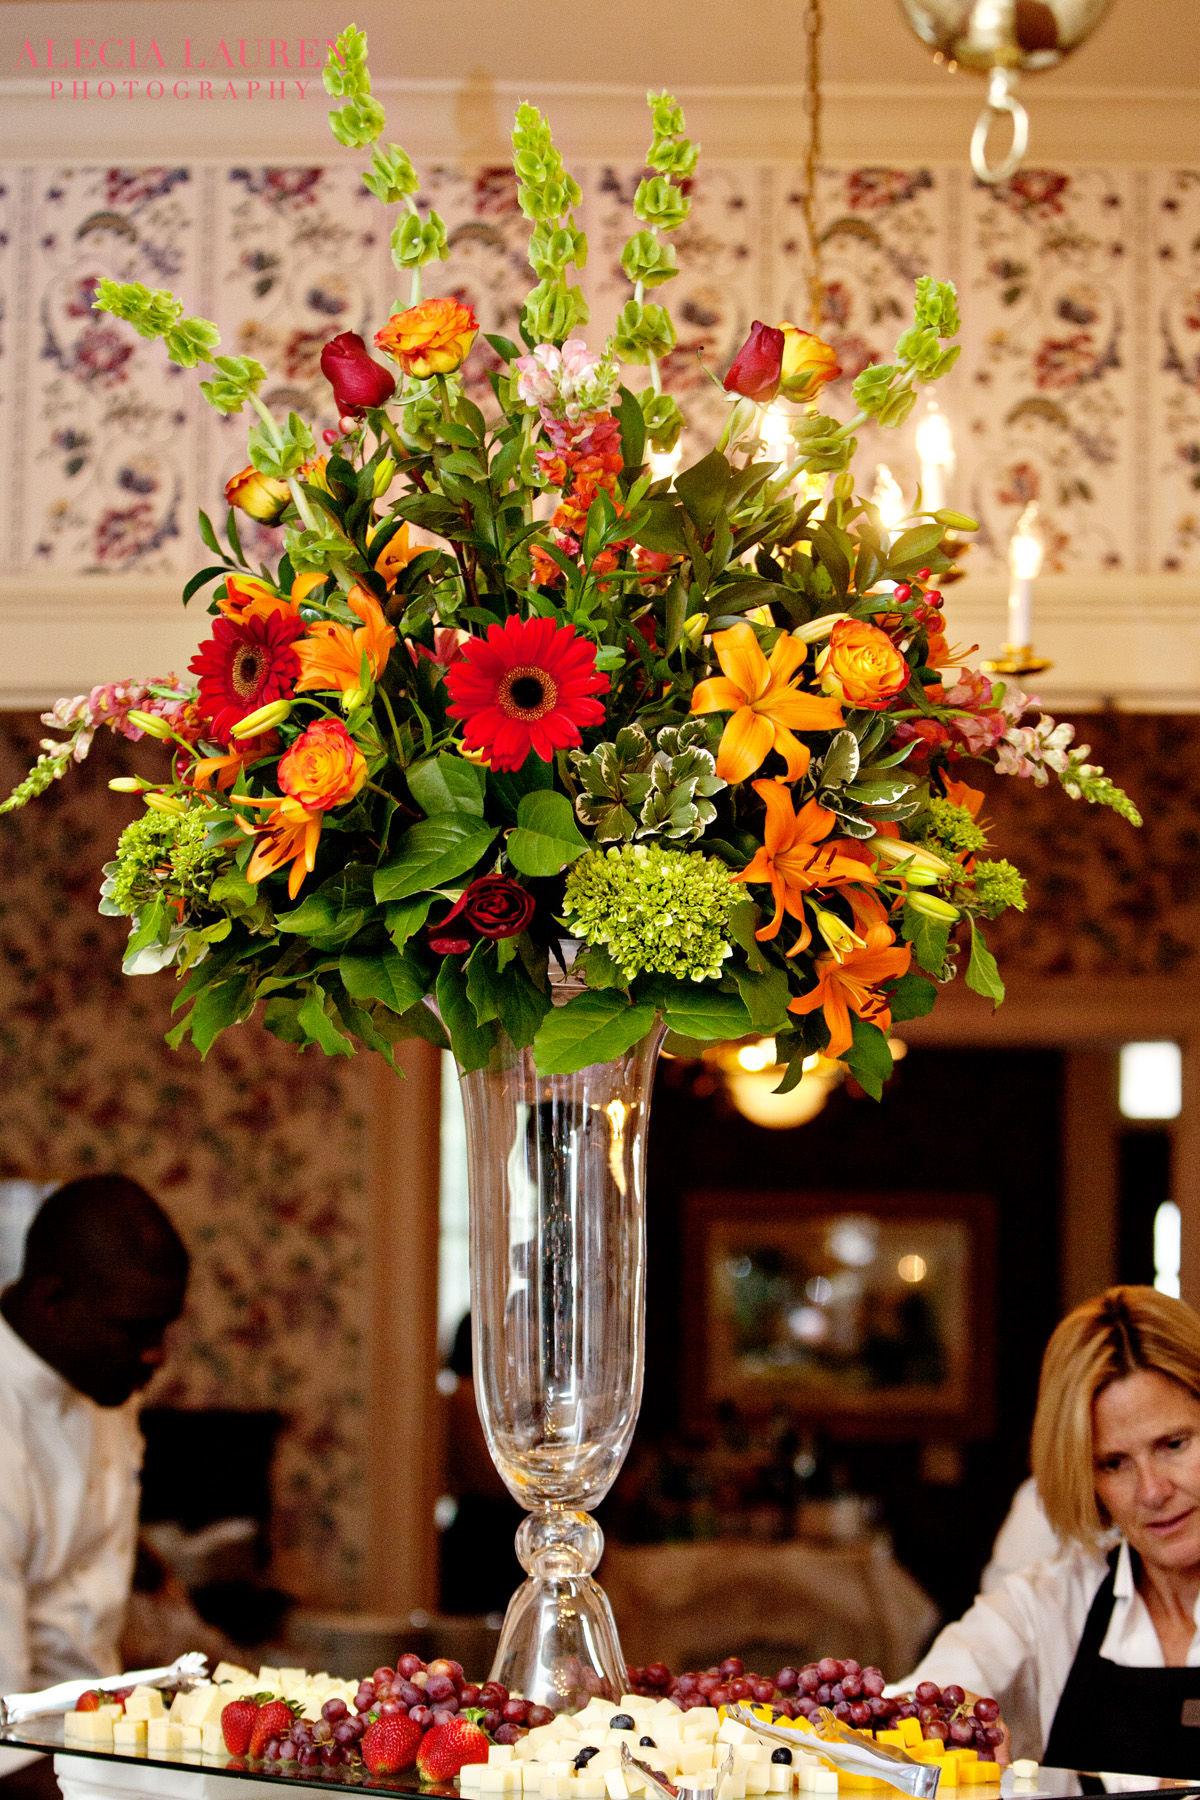 Wedding reception flowers centerpieces decorations carithers trumpet vase reviewsmspy